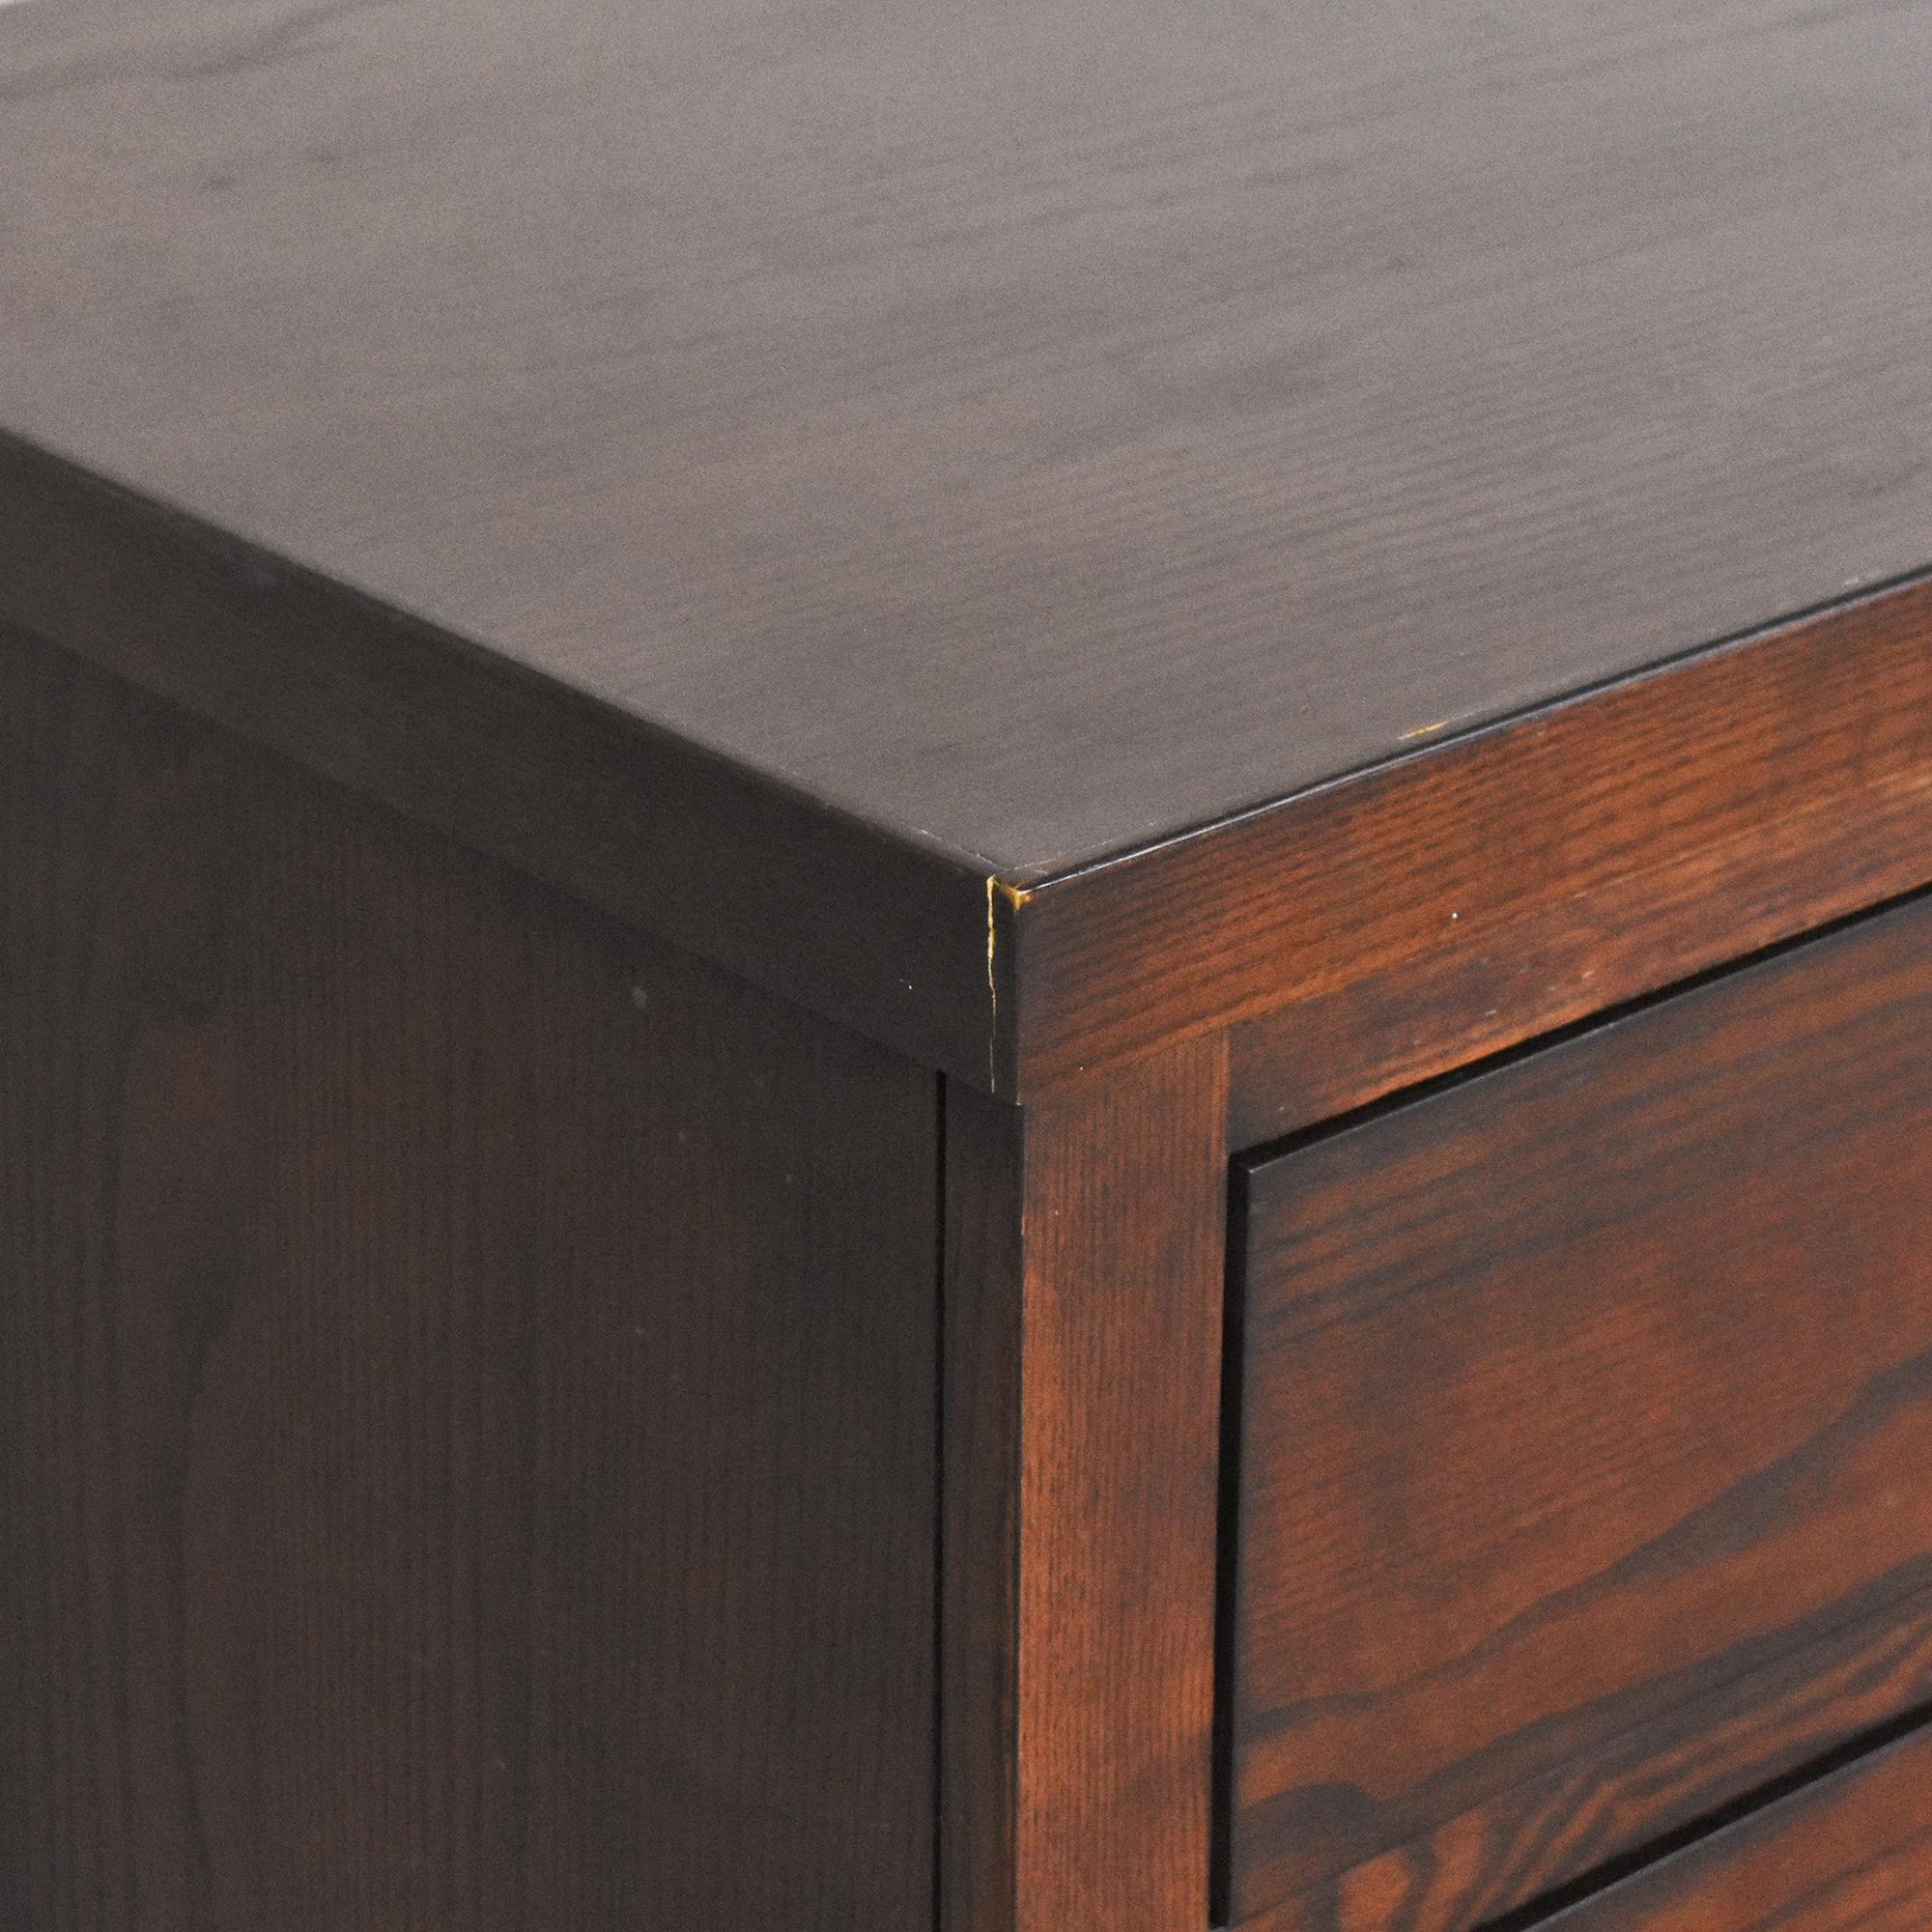 buy Ethan Allen Horizons Collection Six Drawer Dresser Ethan Allen